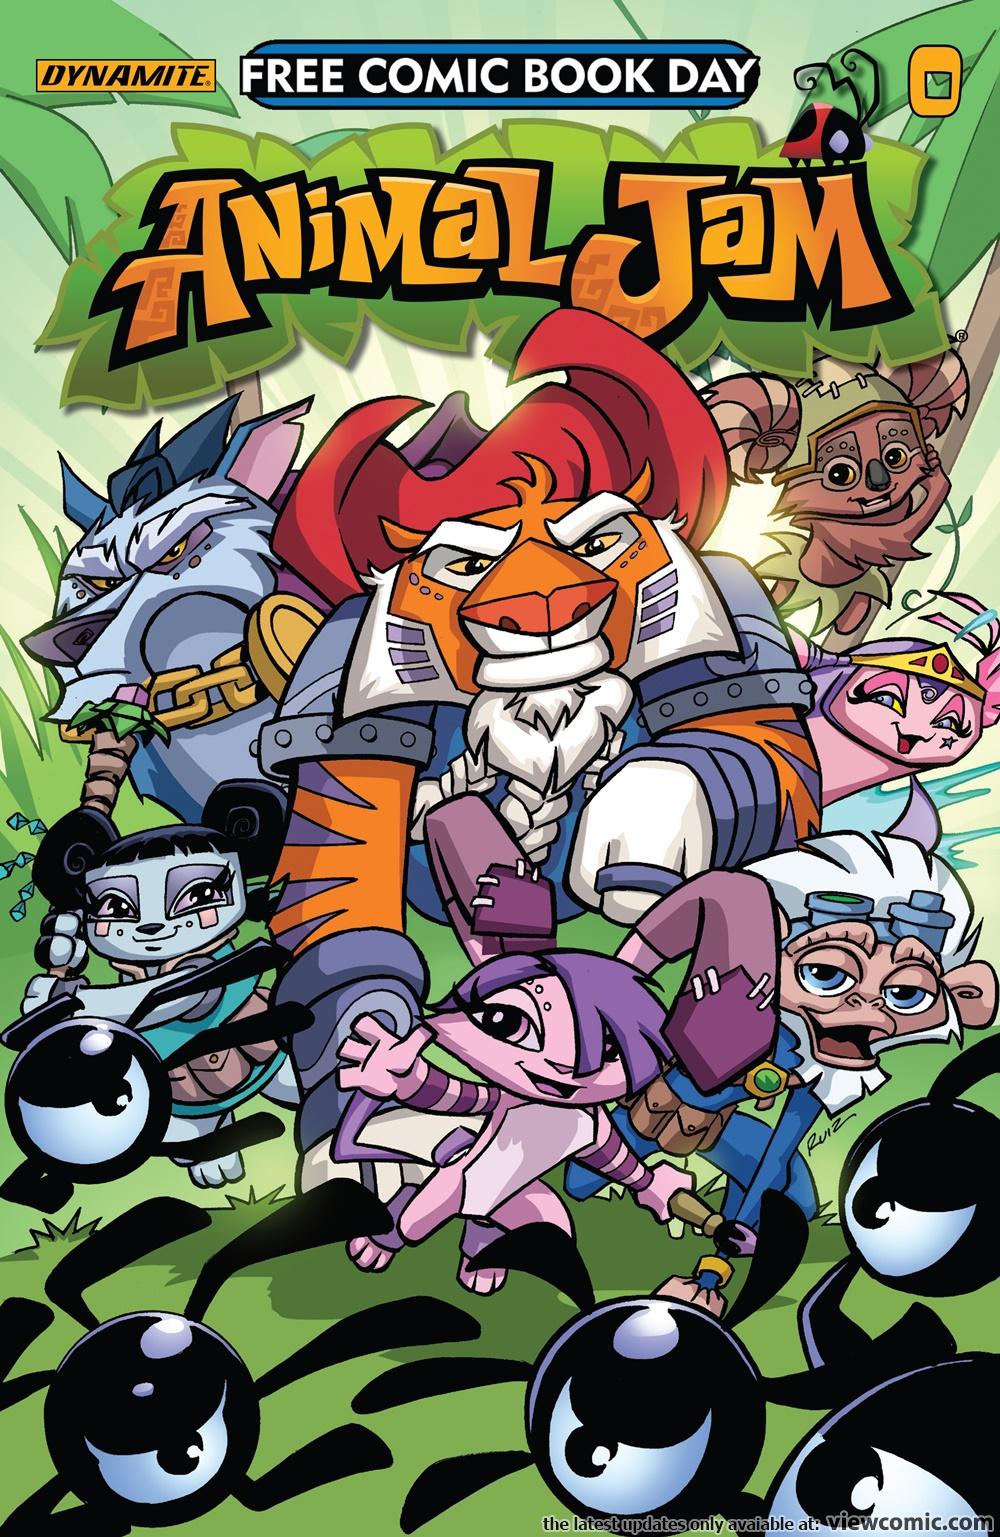 Free Comic Book Day 2017 – Animal Jam 000 (FCBD 2017